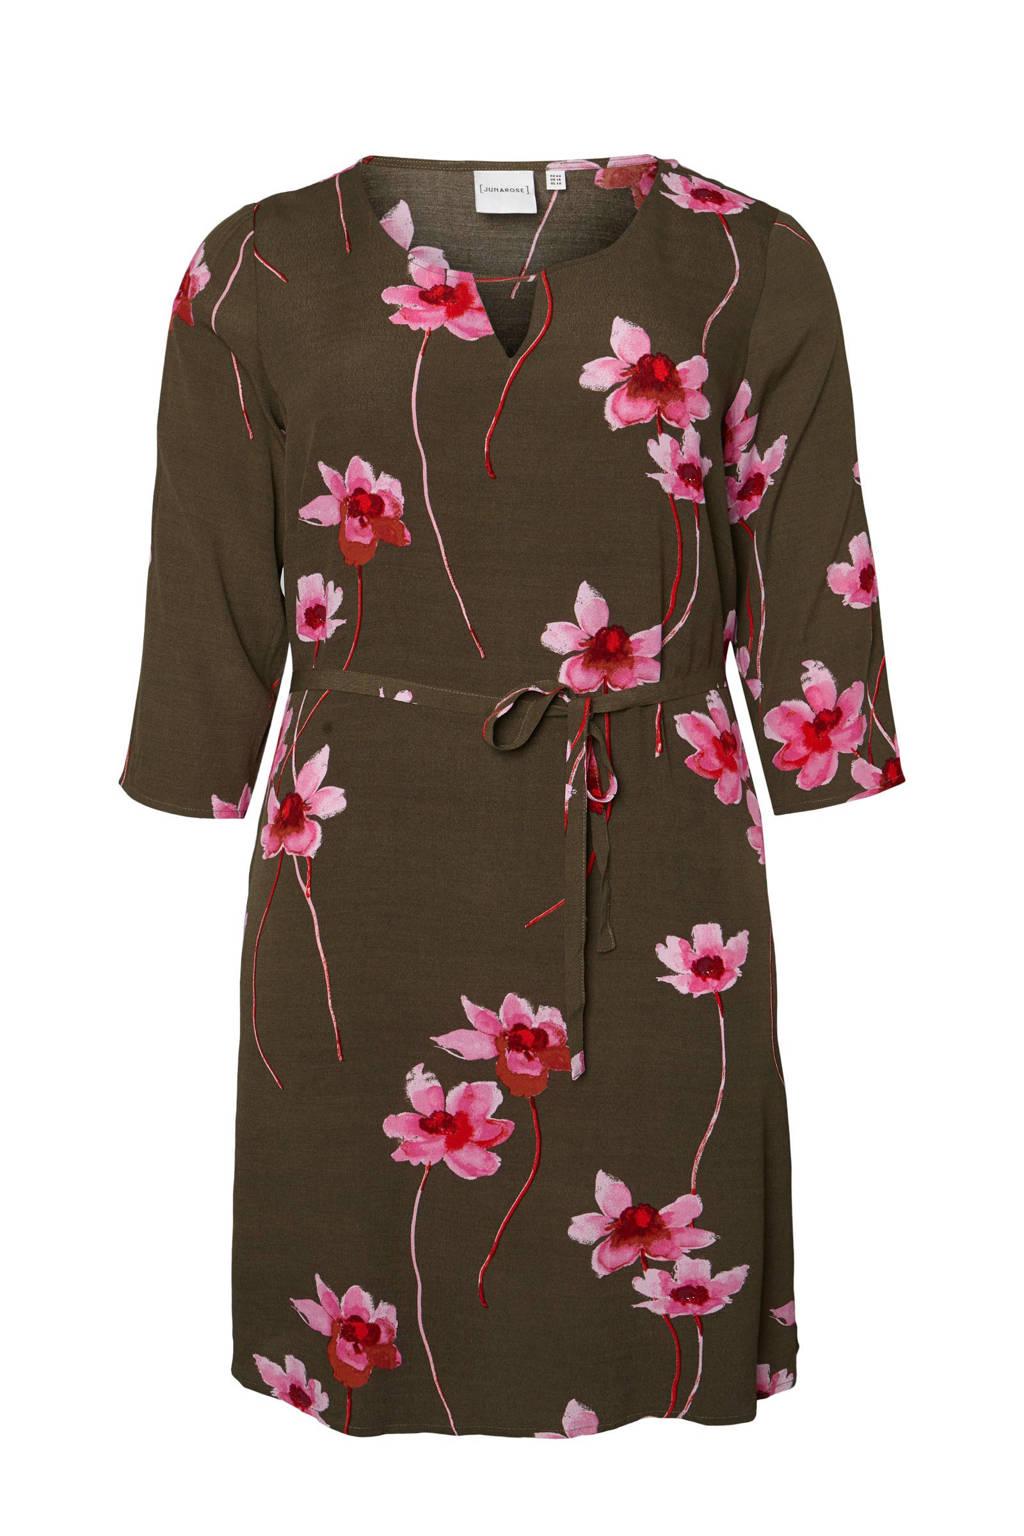 JUNAROSE jurk met bloemenprint, Groen/roze